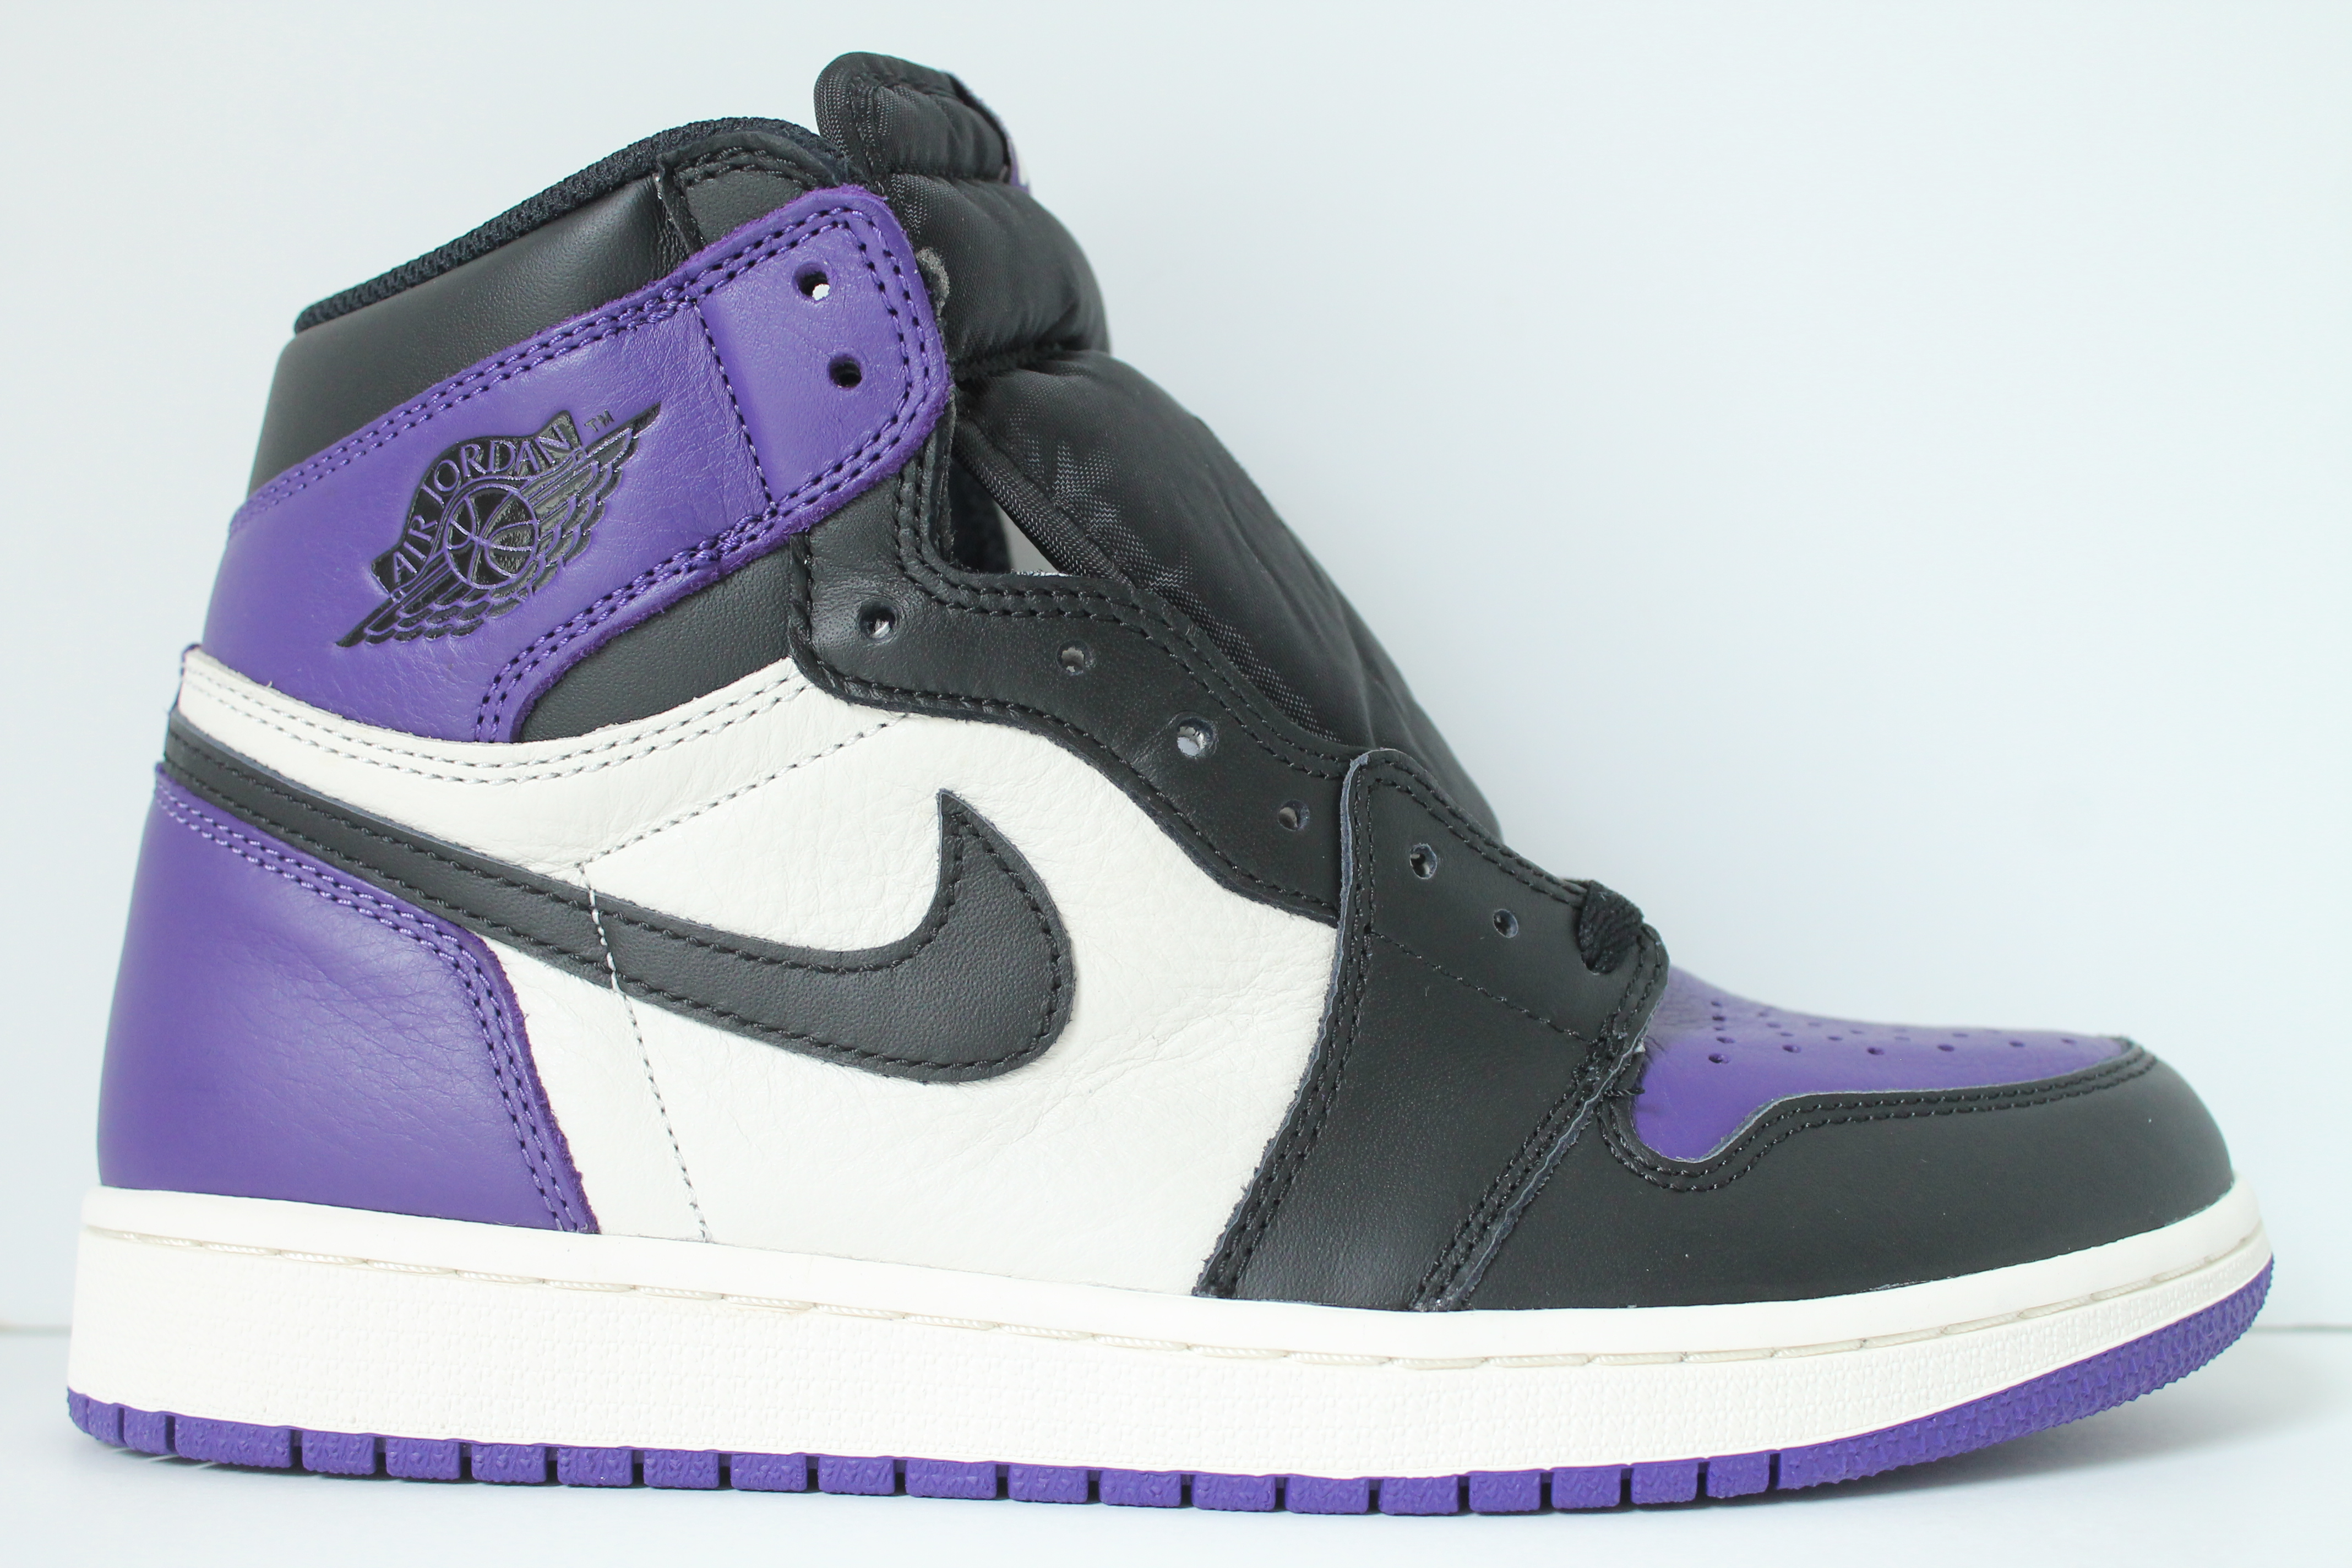 3220b86ea92f Air Jordan 1 Retro High OG – Court Purple